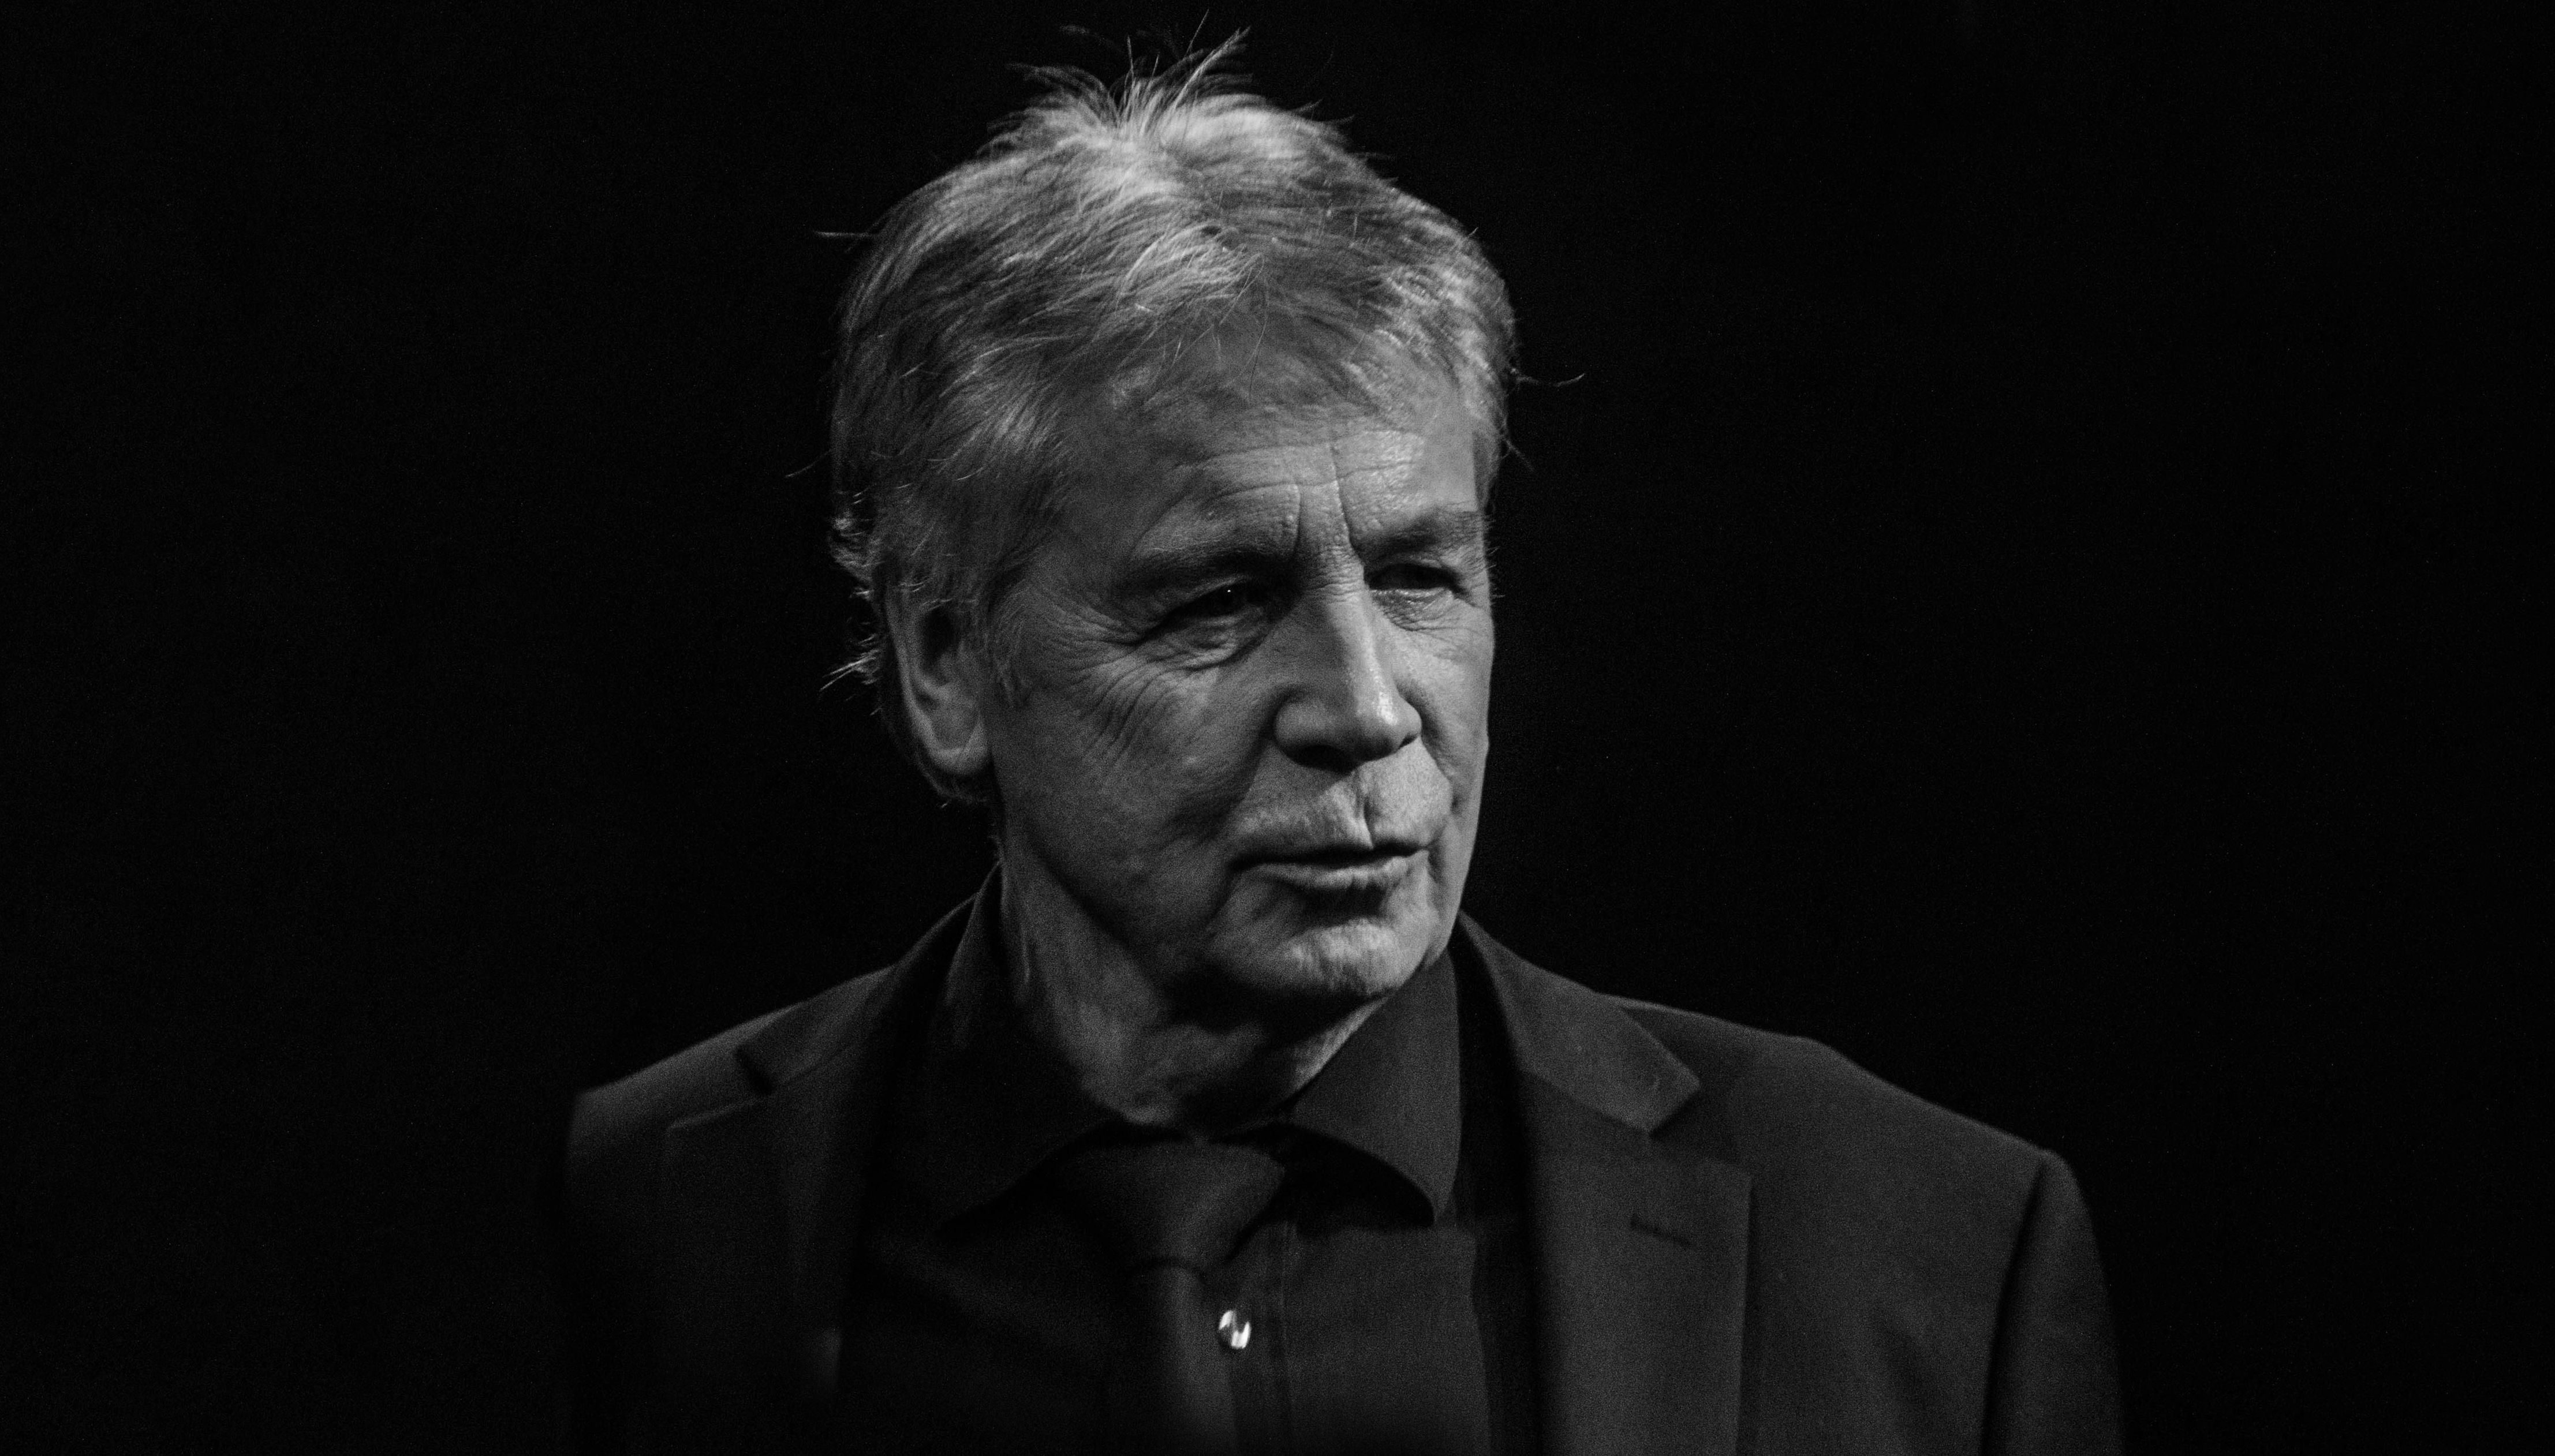 Knut Lystad